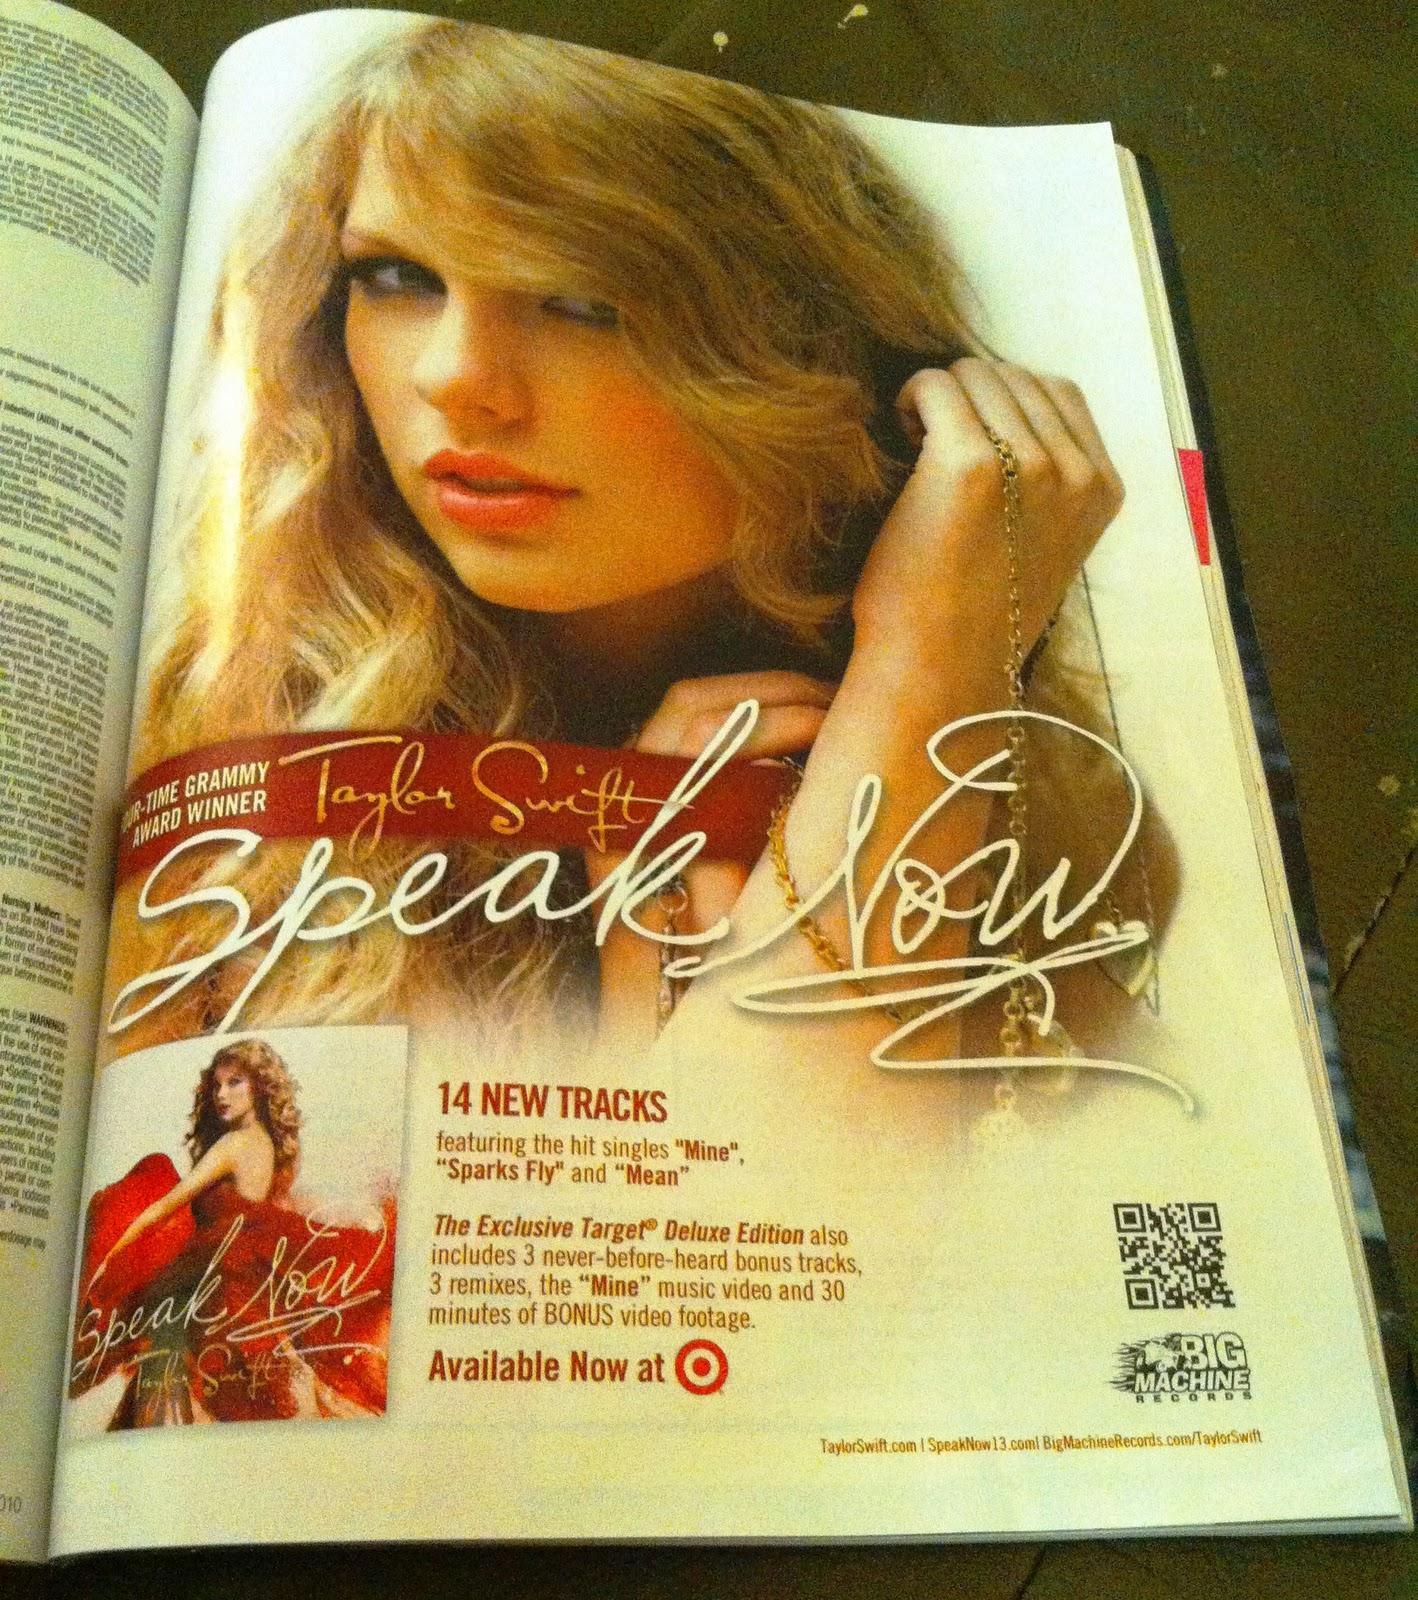 http://1.bp.blogspot.com/_Wl2x2w2vEG4/TTRjQKHSK8I/AAAAAAAAA2A/-NTKhbQi-Gk/s1600/Taylor_Swift_QR_codes_Music.JPG